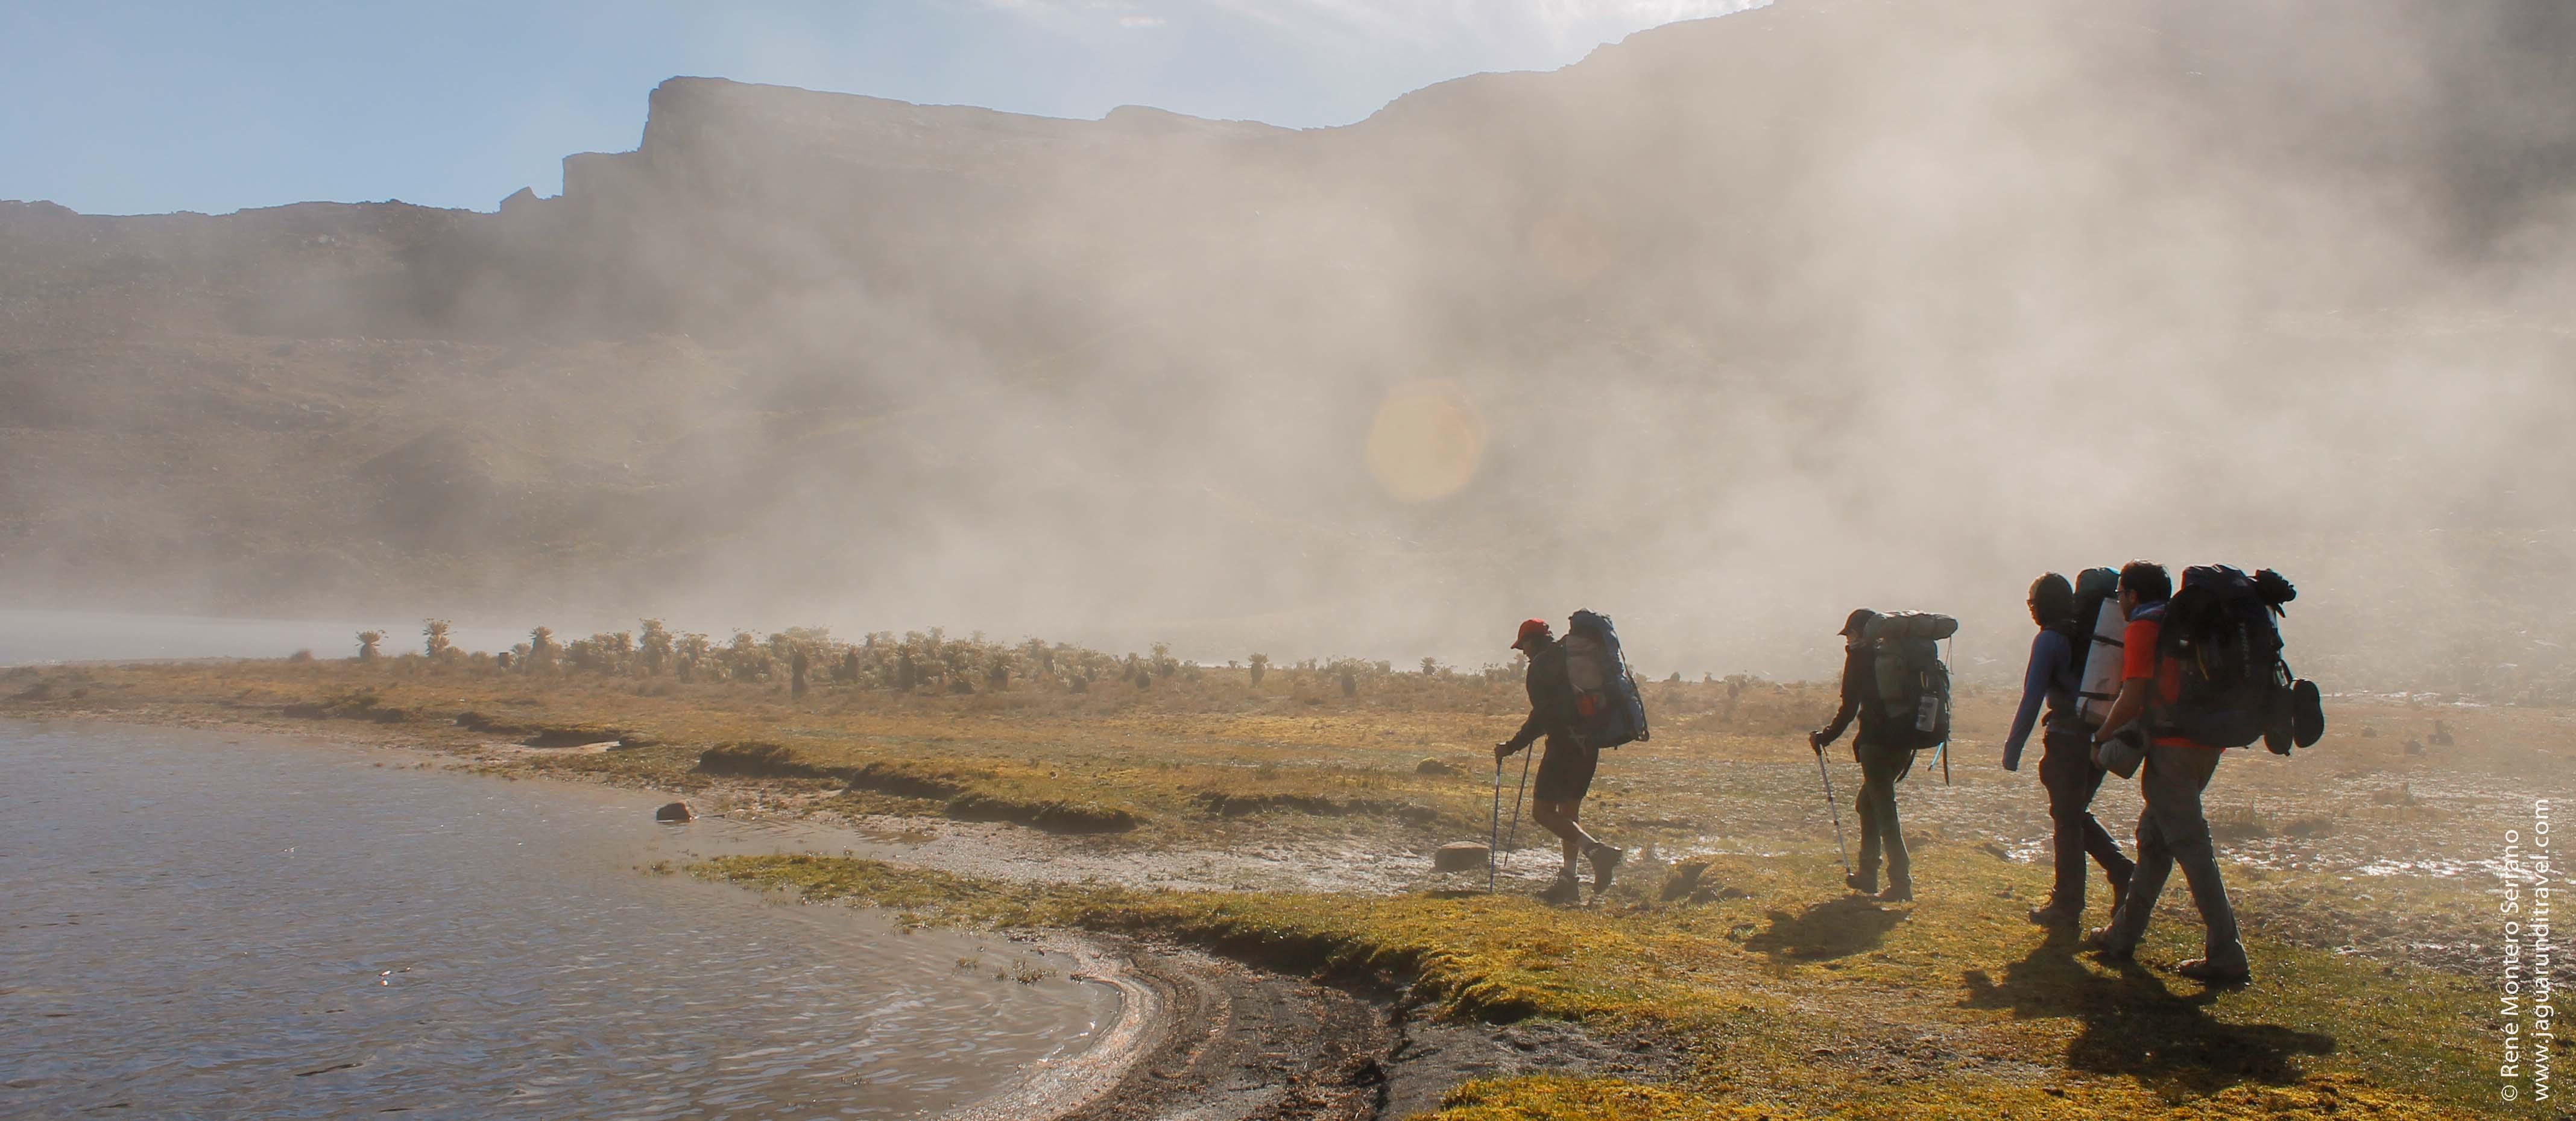 Cocuy Trekking tour in Colombia